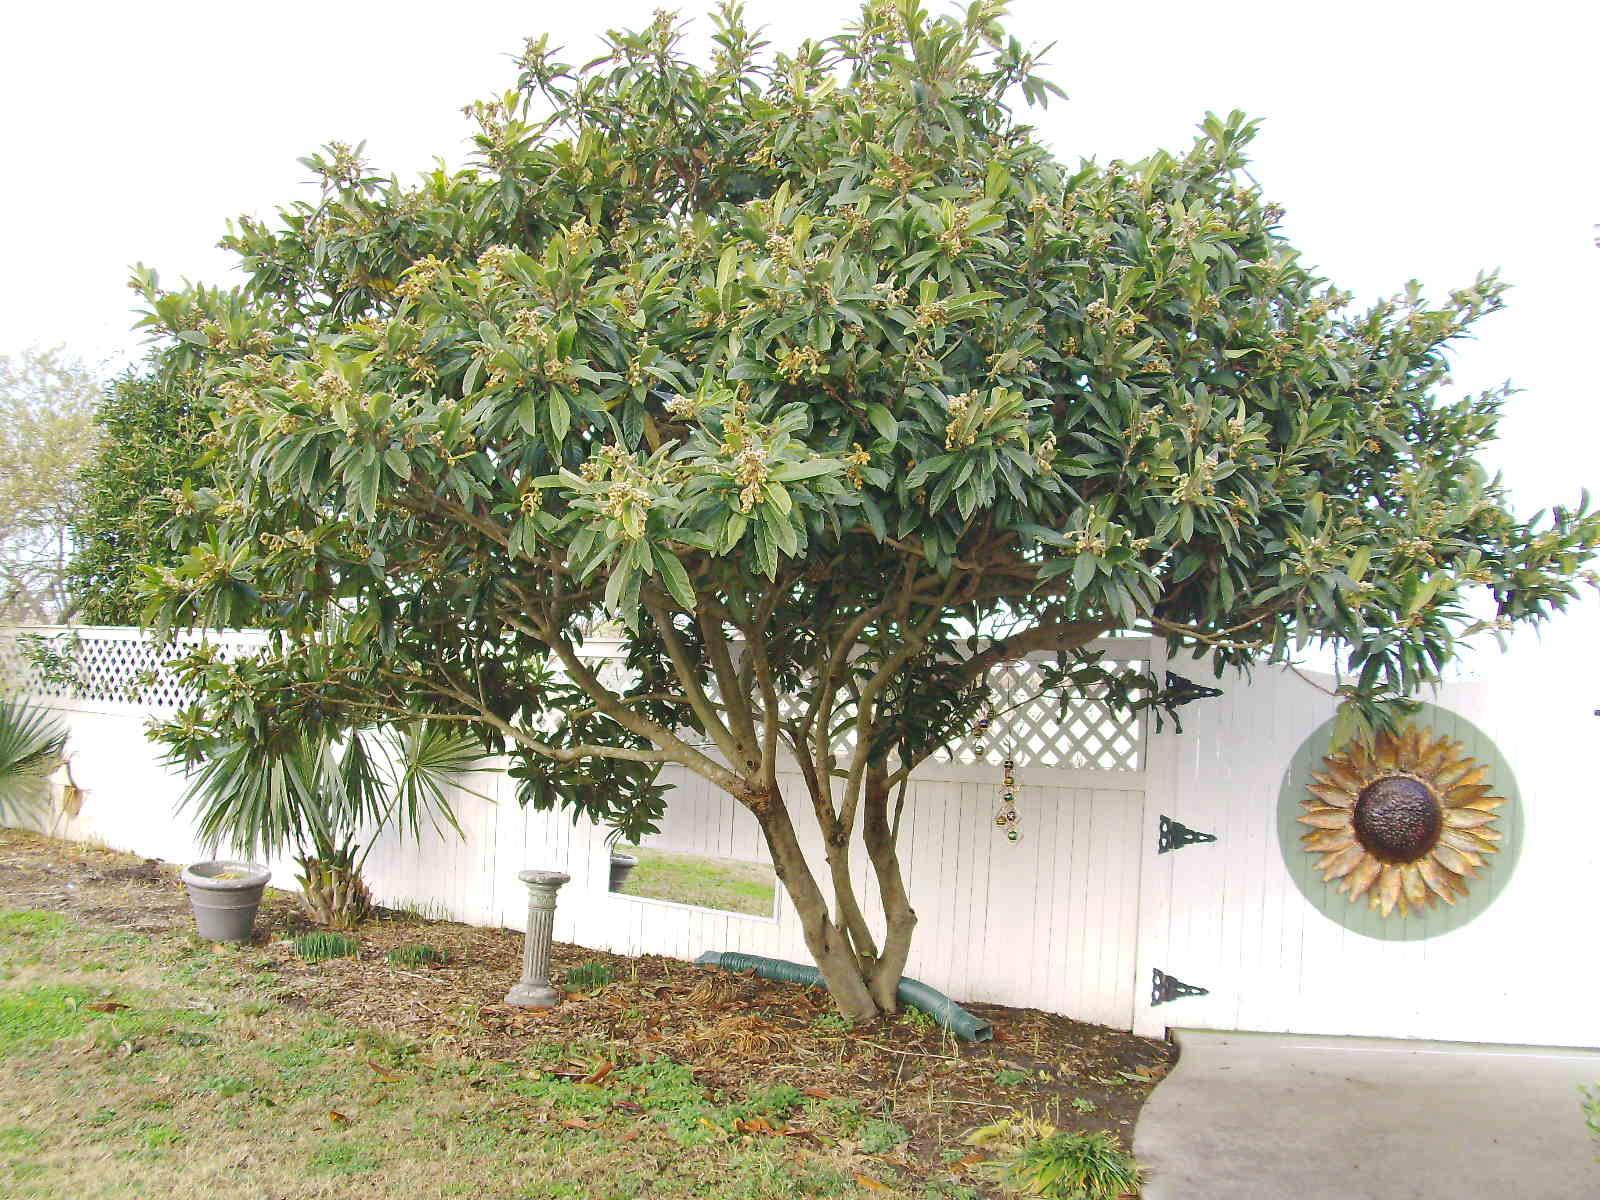 Japanese Loquat, Buy in Tampa, Brandon, Riverview, Apollo Beach